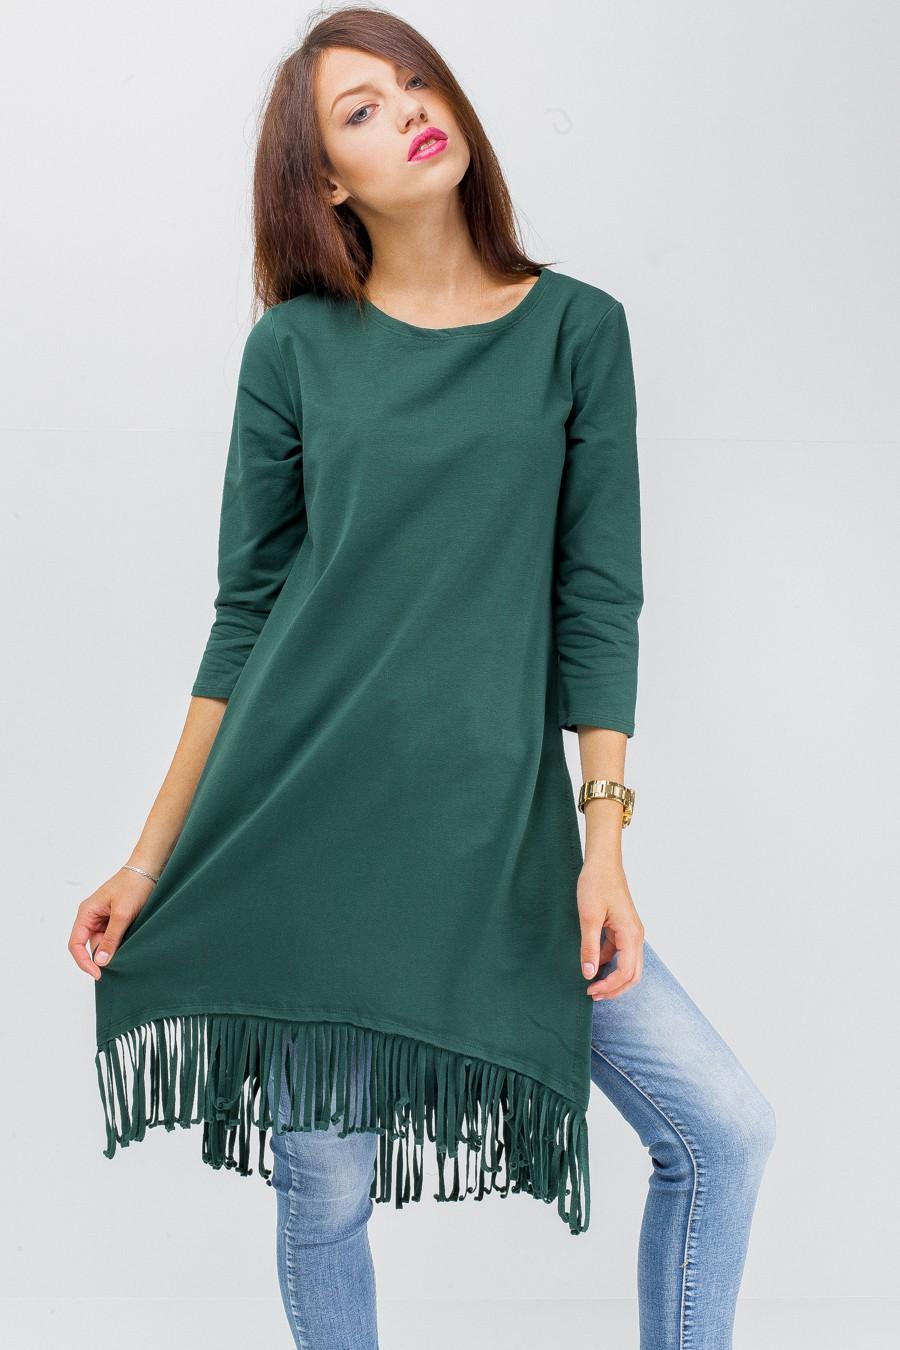 базовый гардероб 2018 2019: туника зеленая бахрома